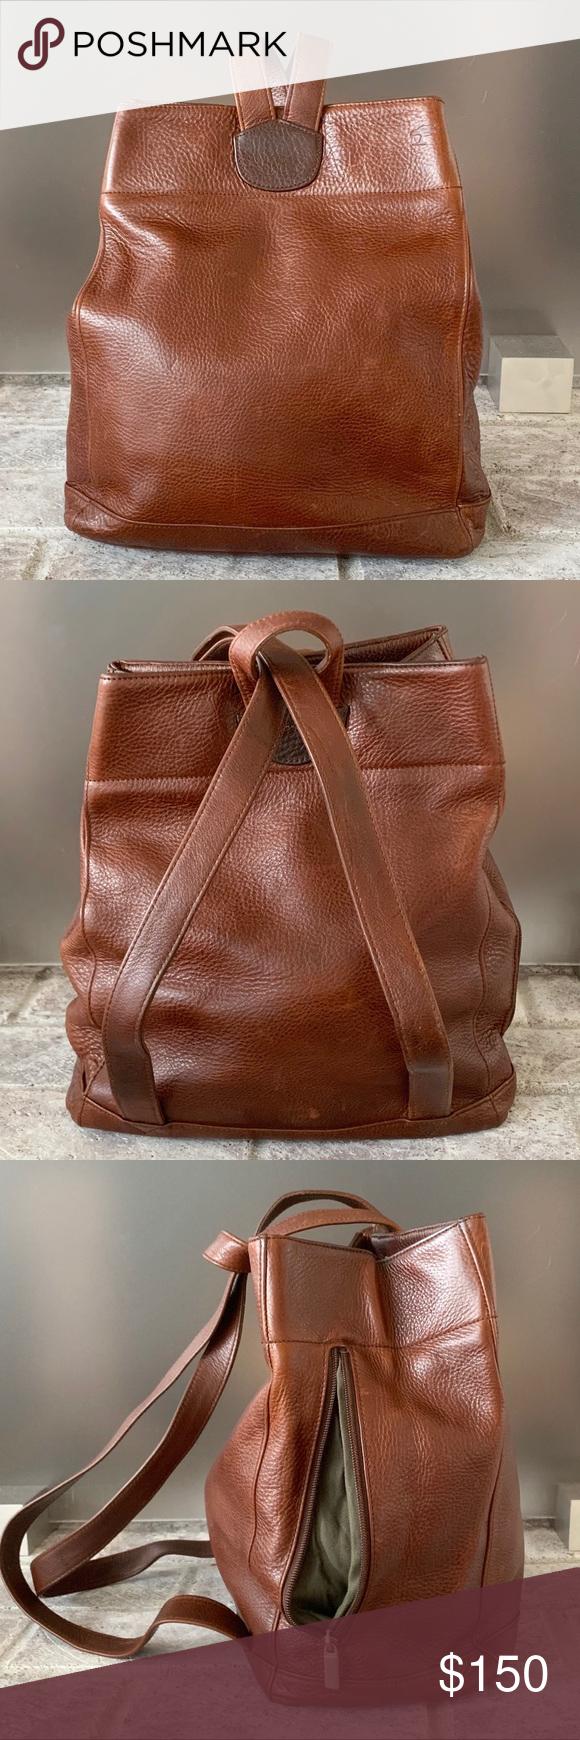 Ellington Leather Backpack Handbag